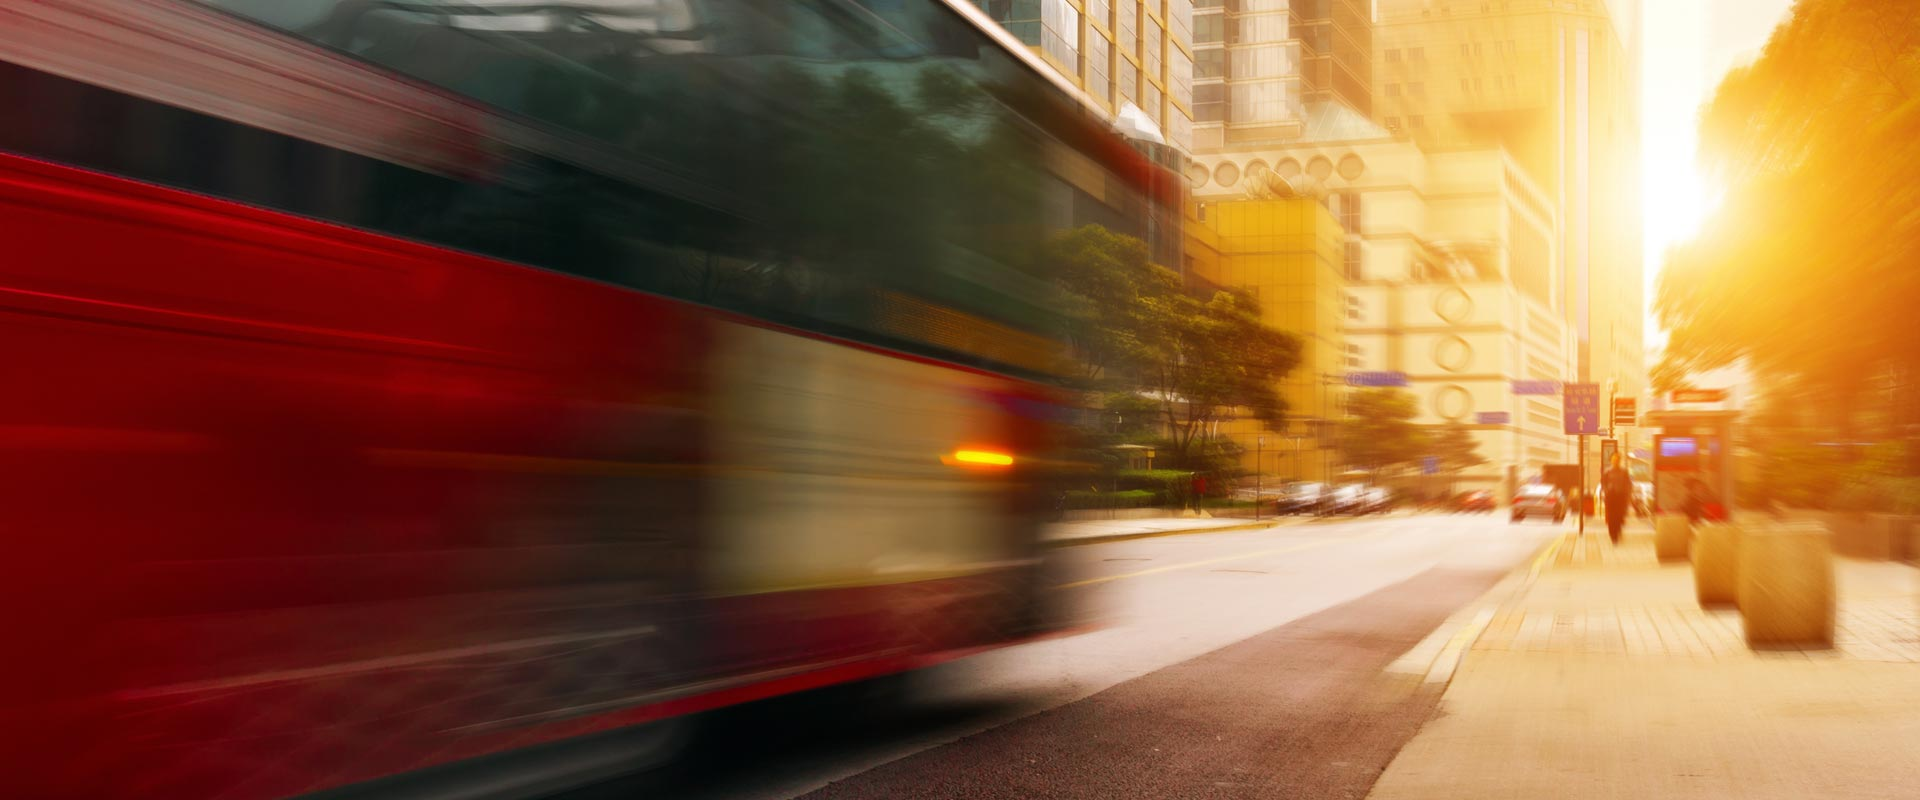 P-Transport - Radim Prokopec